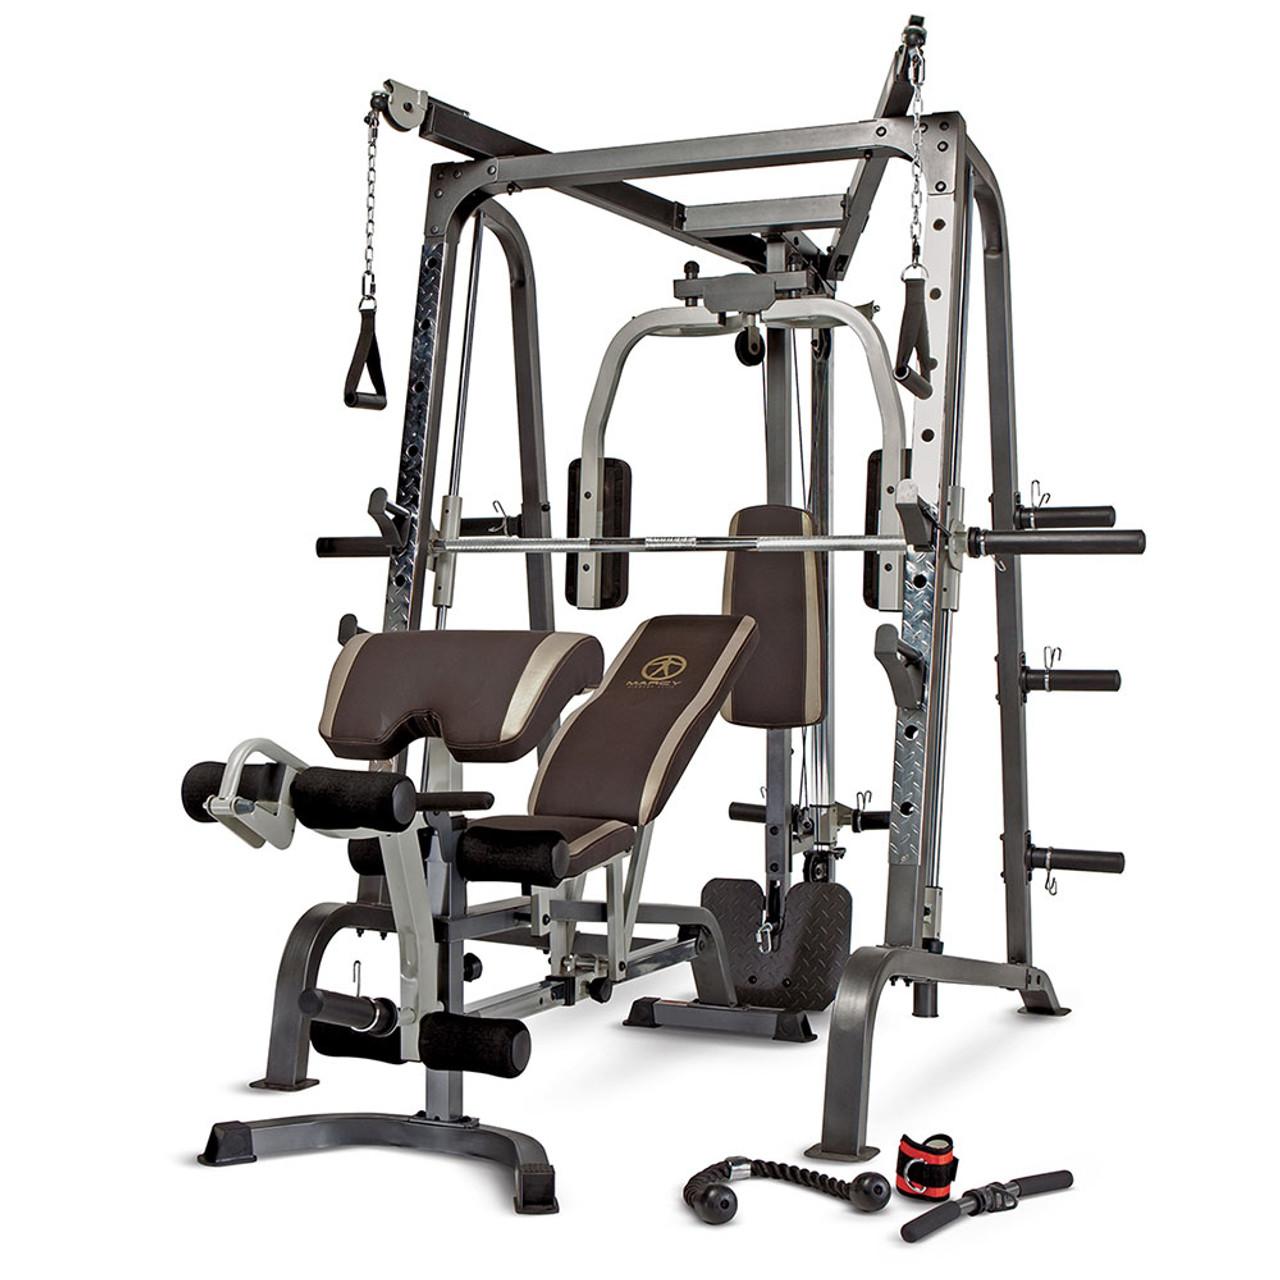 The best quality brand smith machine home gym md 9010g marcy pro